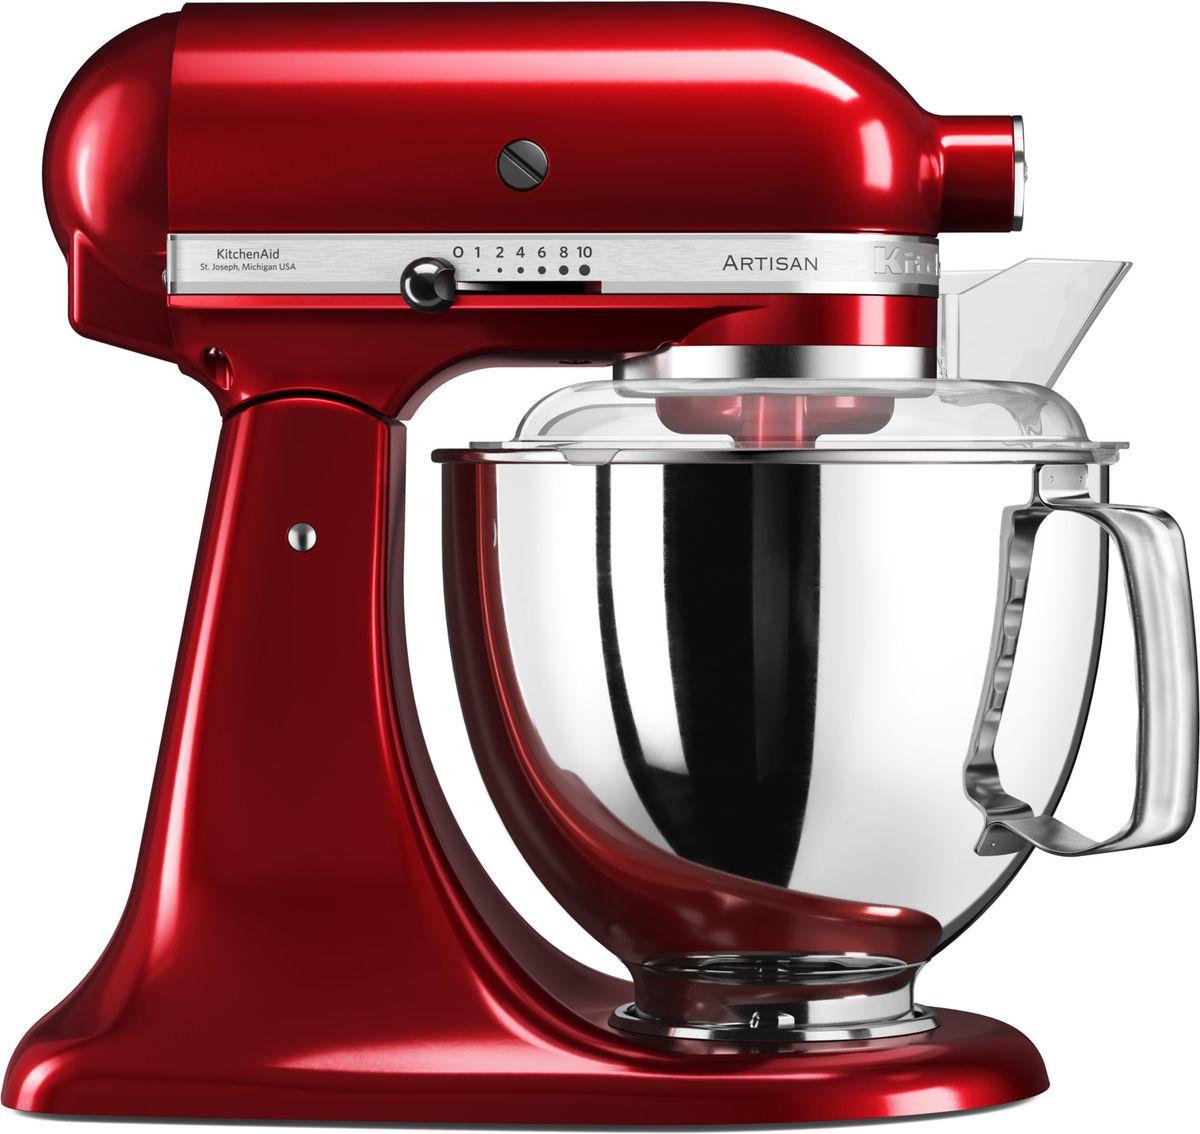 KitchenAid Artisan, Red миксер планетарный (5KSM175PSECA) кухонный комбайн kitchenaid artisan 5kfp1644eac